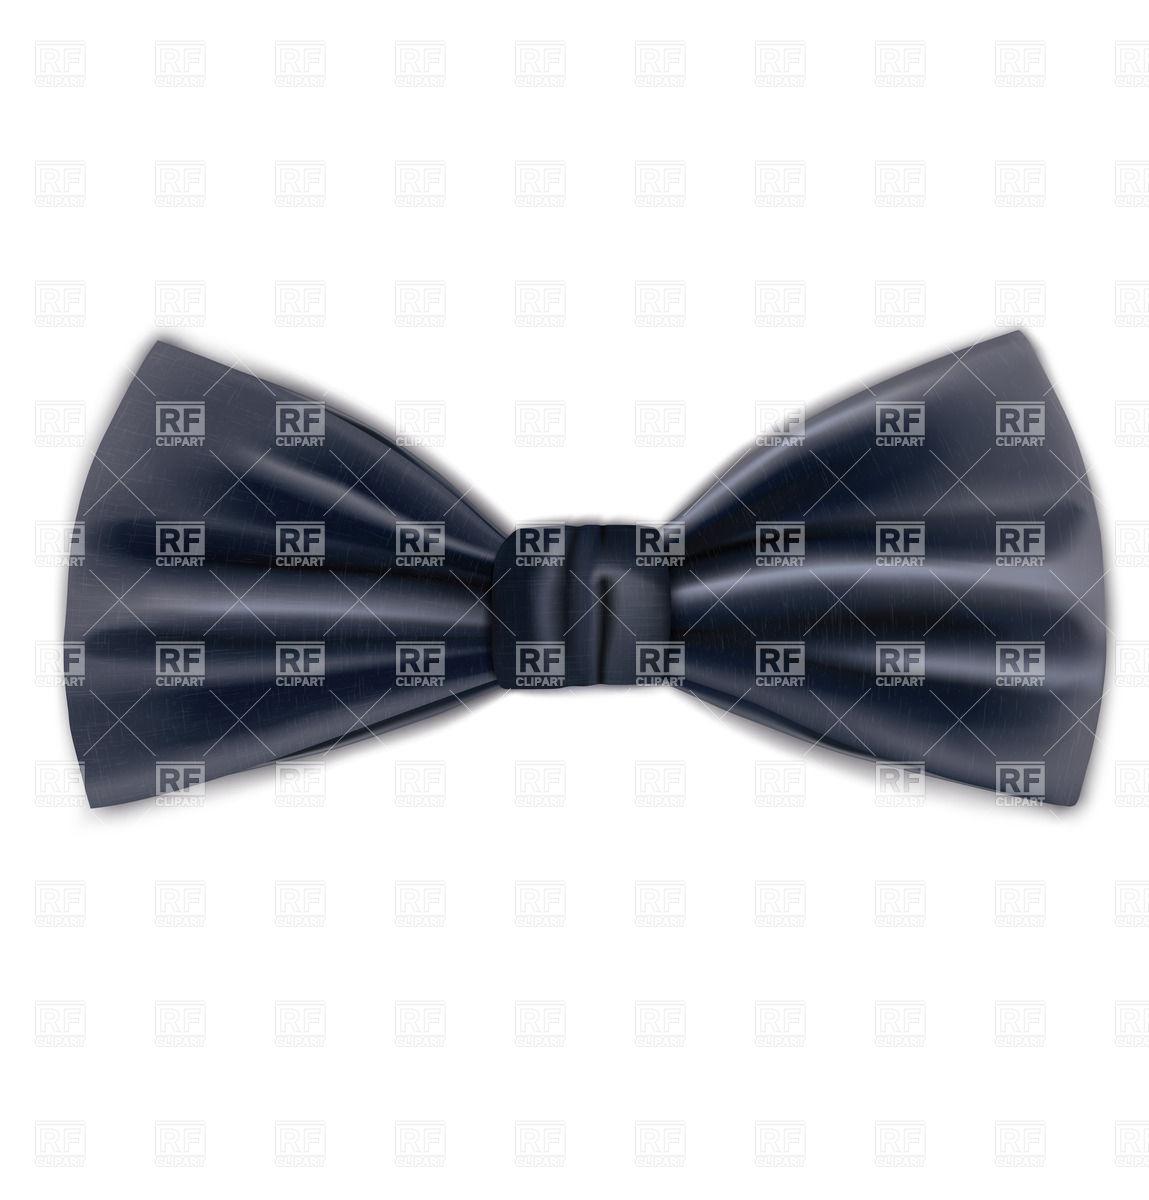 1149x1200 Black Bow Tie